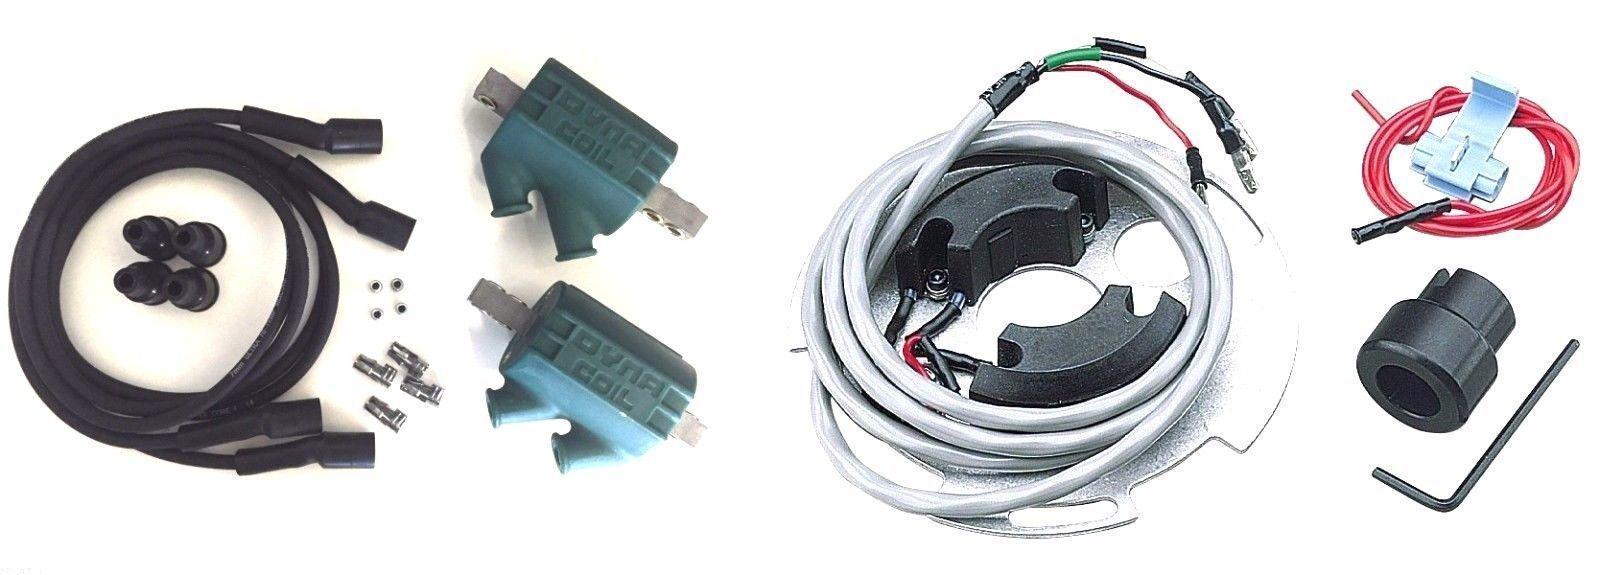 KZ1000 a conversion to CDI ignition 22 Nov 2015 06:01 #699919